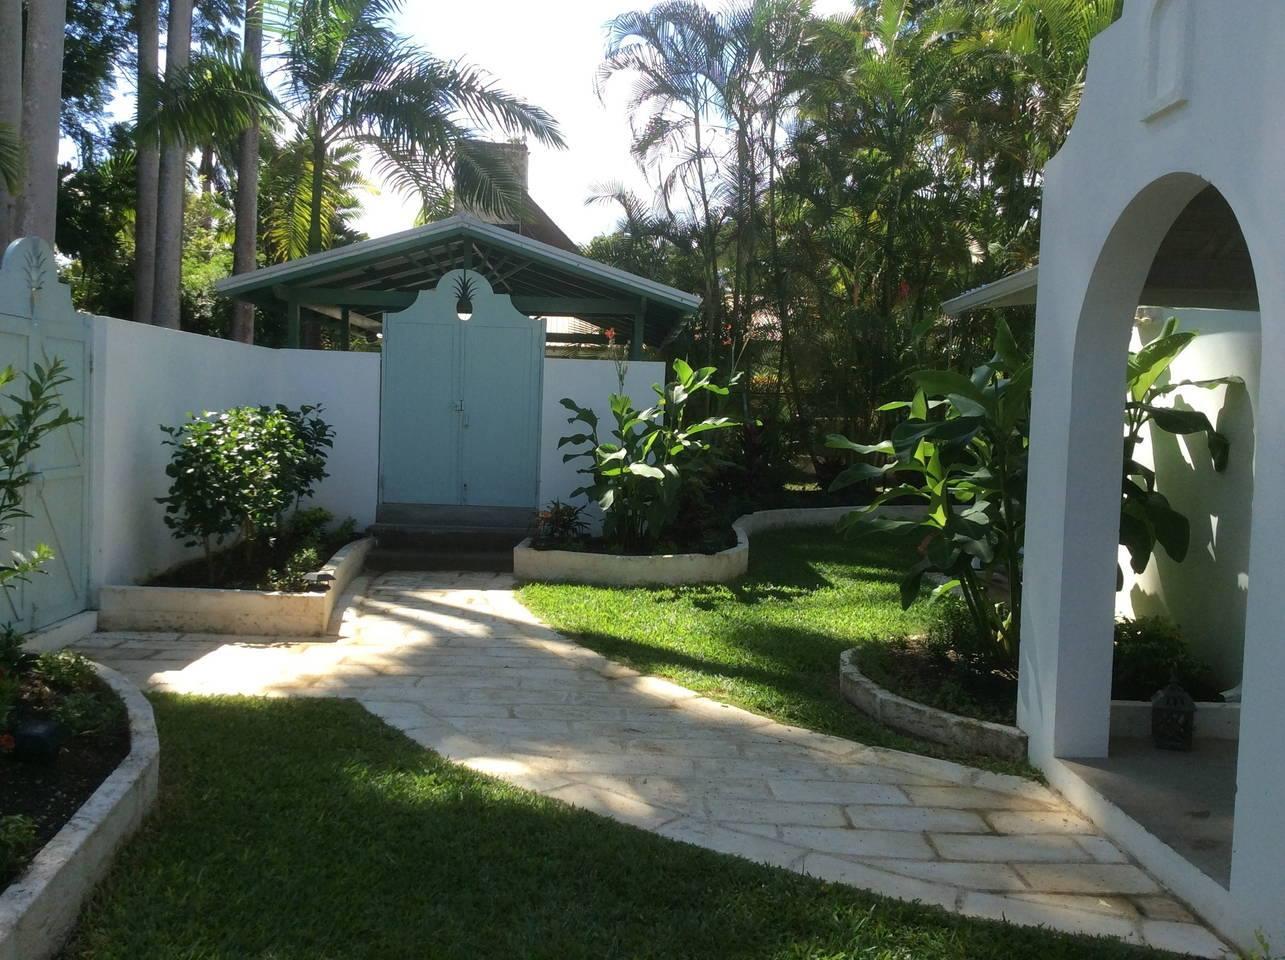 Patio of a Barbados beach house